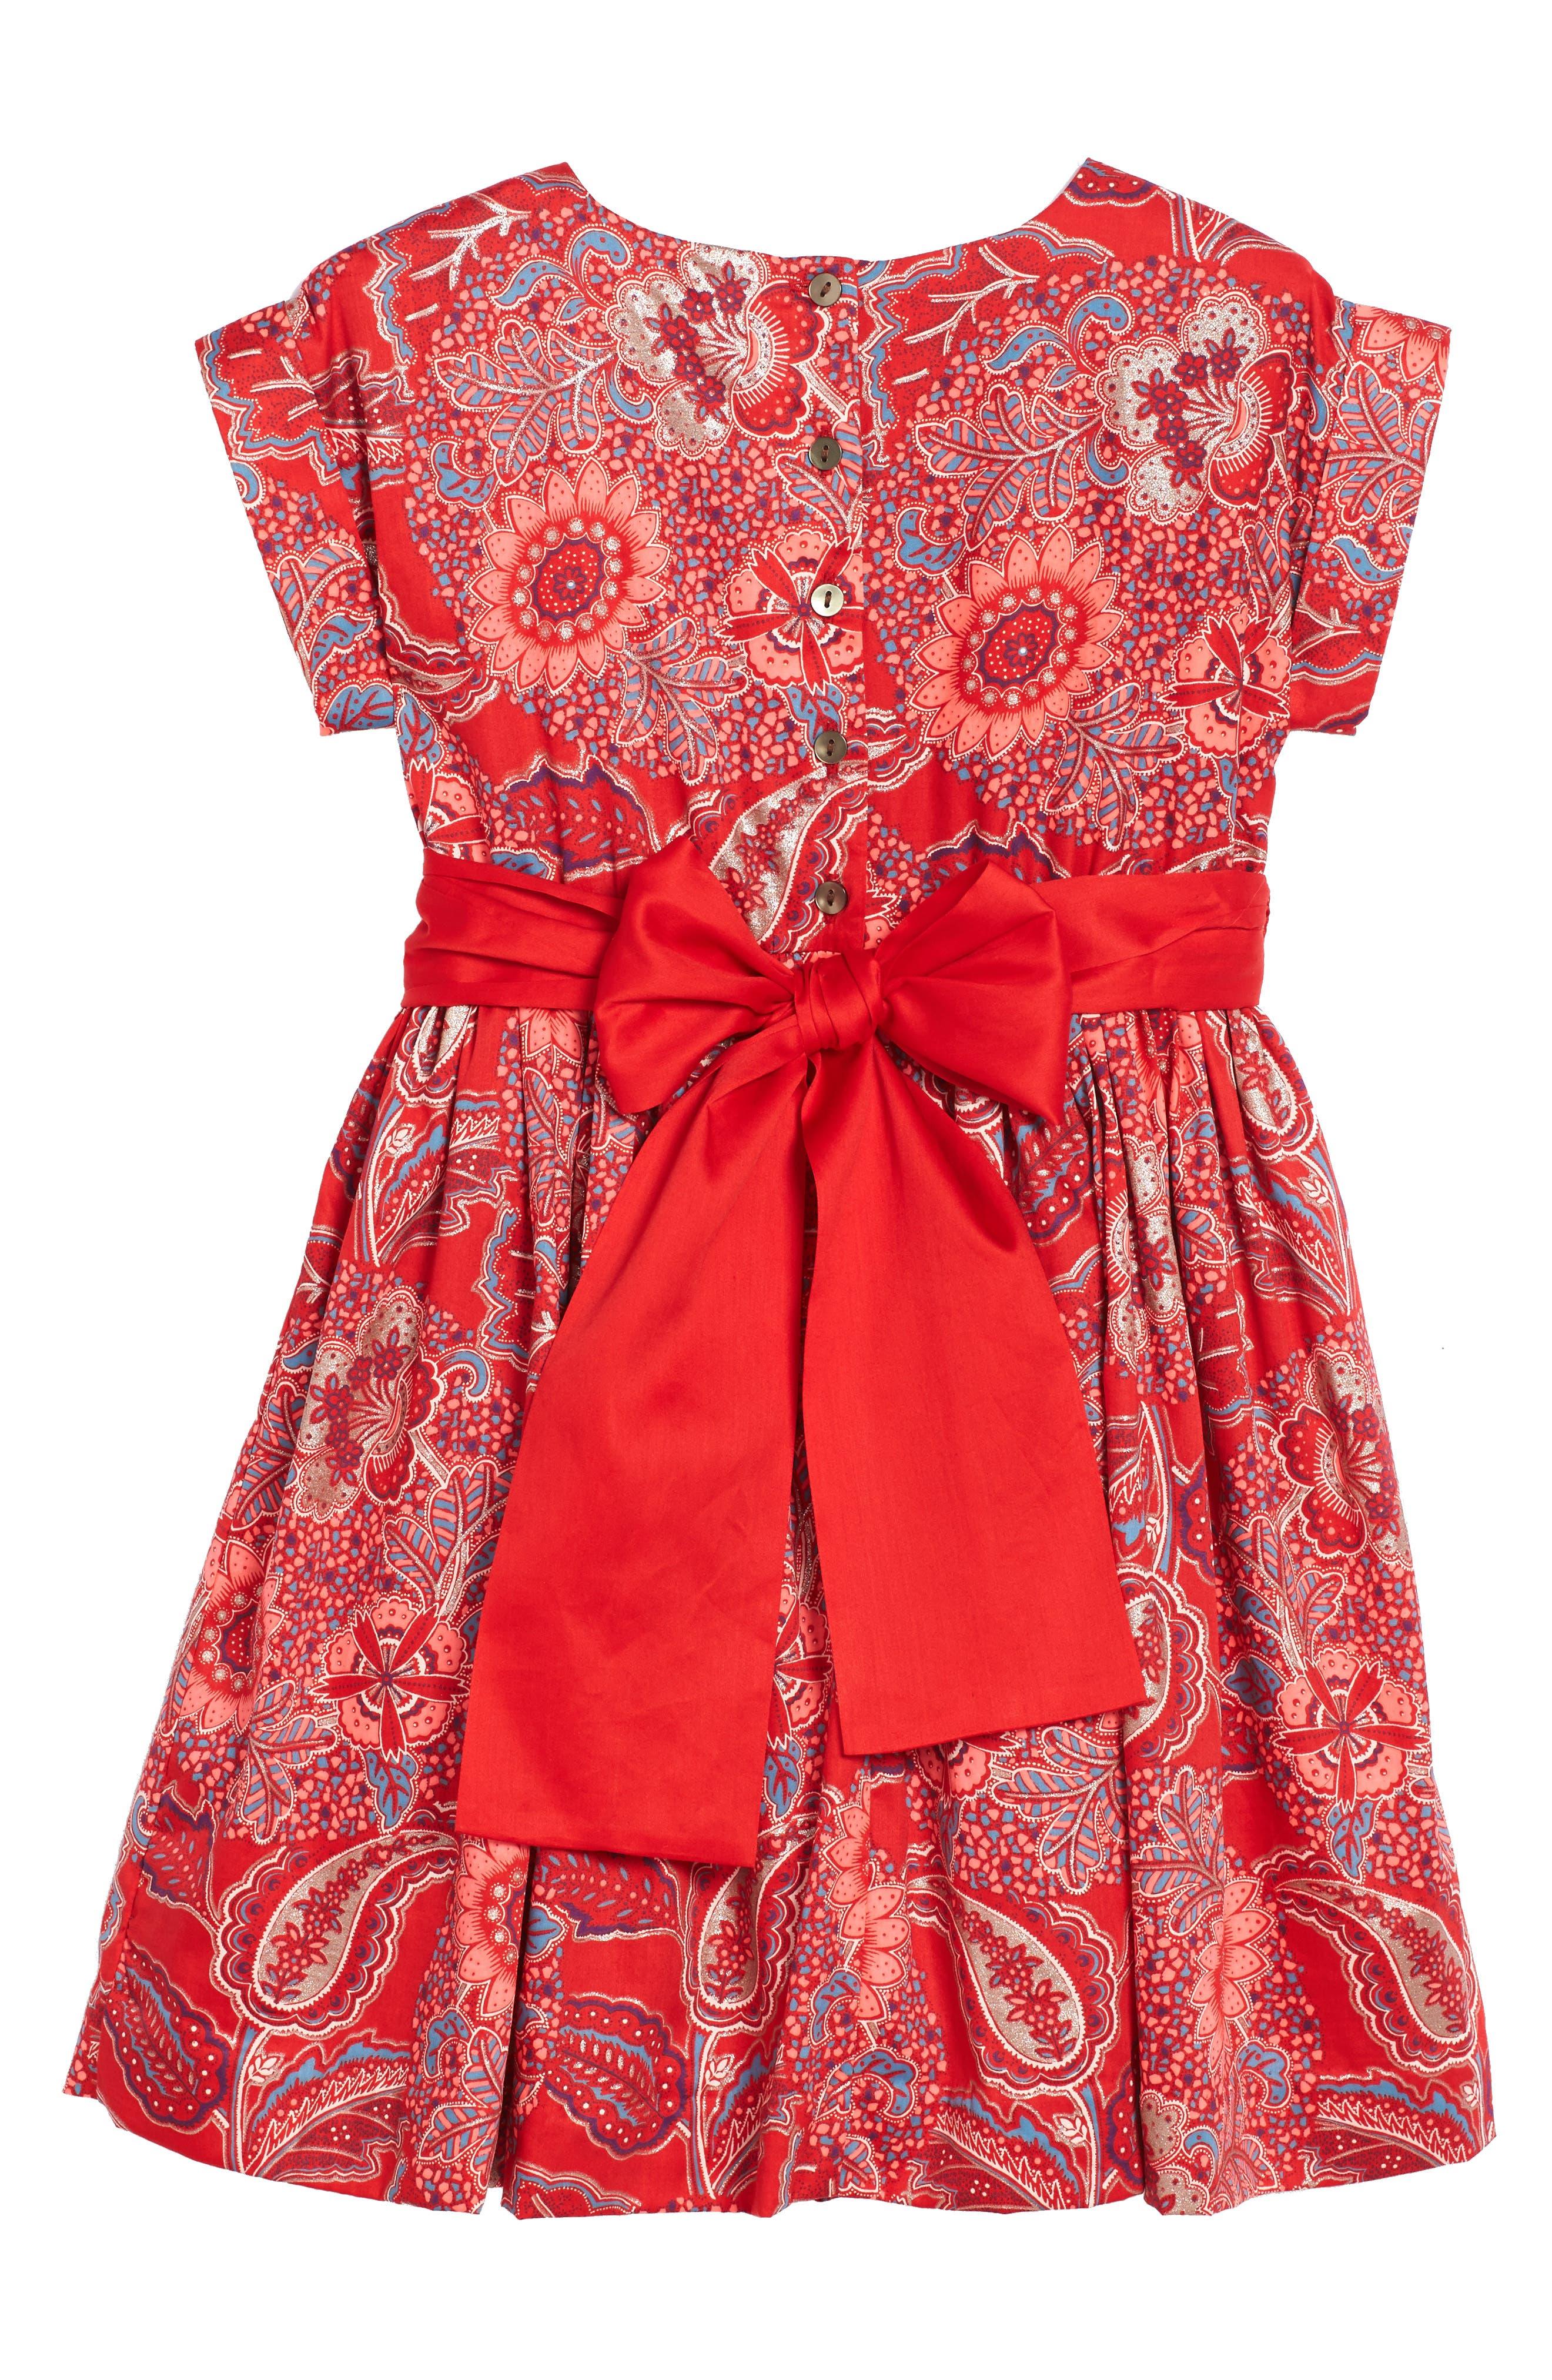 Adaira Sash Dress,                             Alternate thumbnail 2, color,                             615